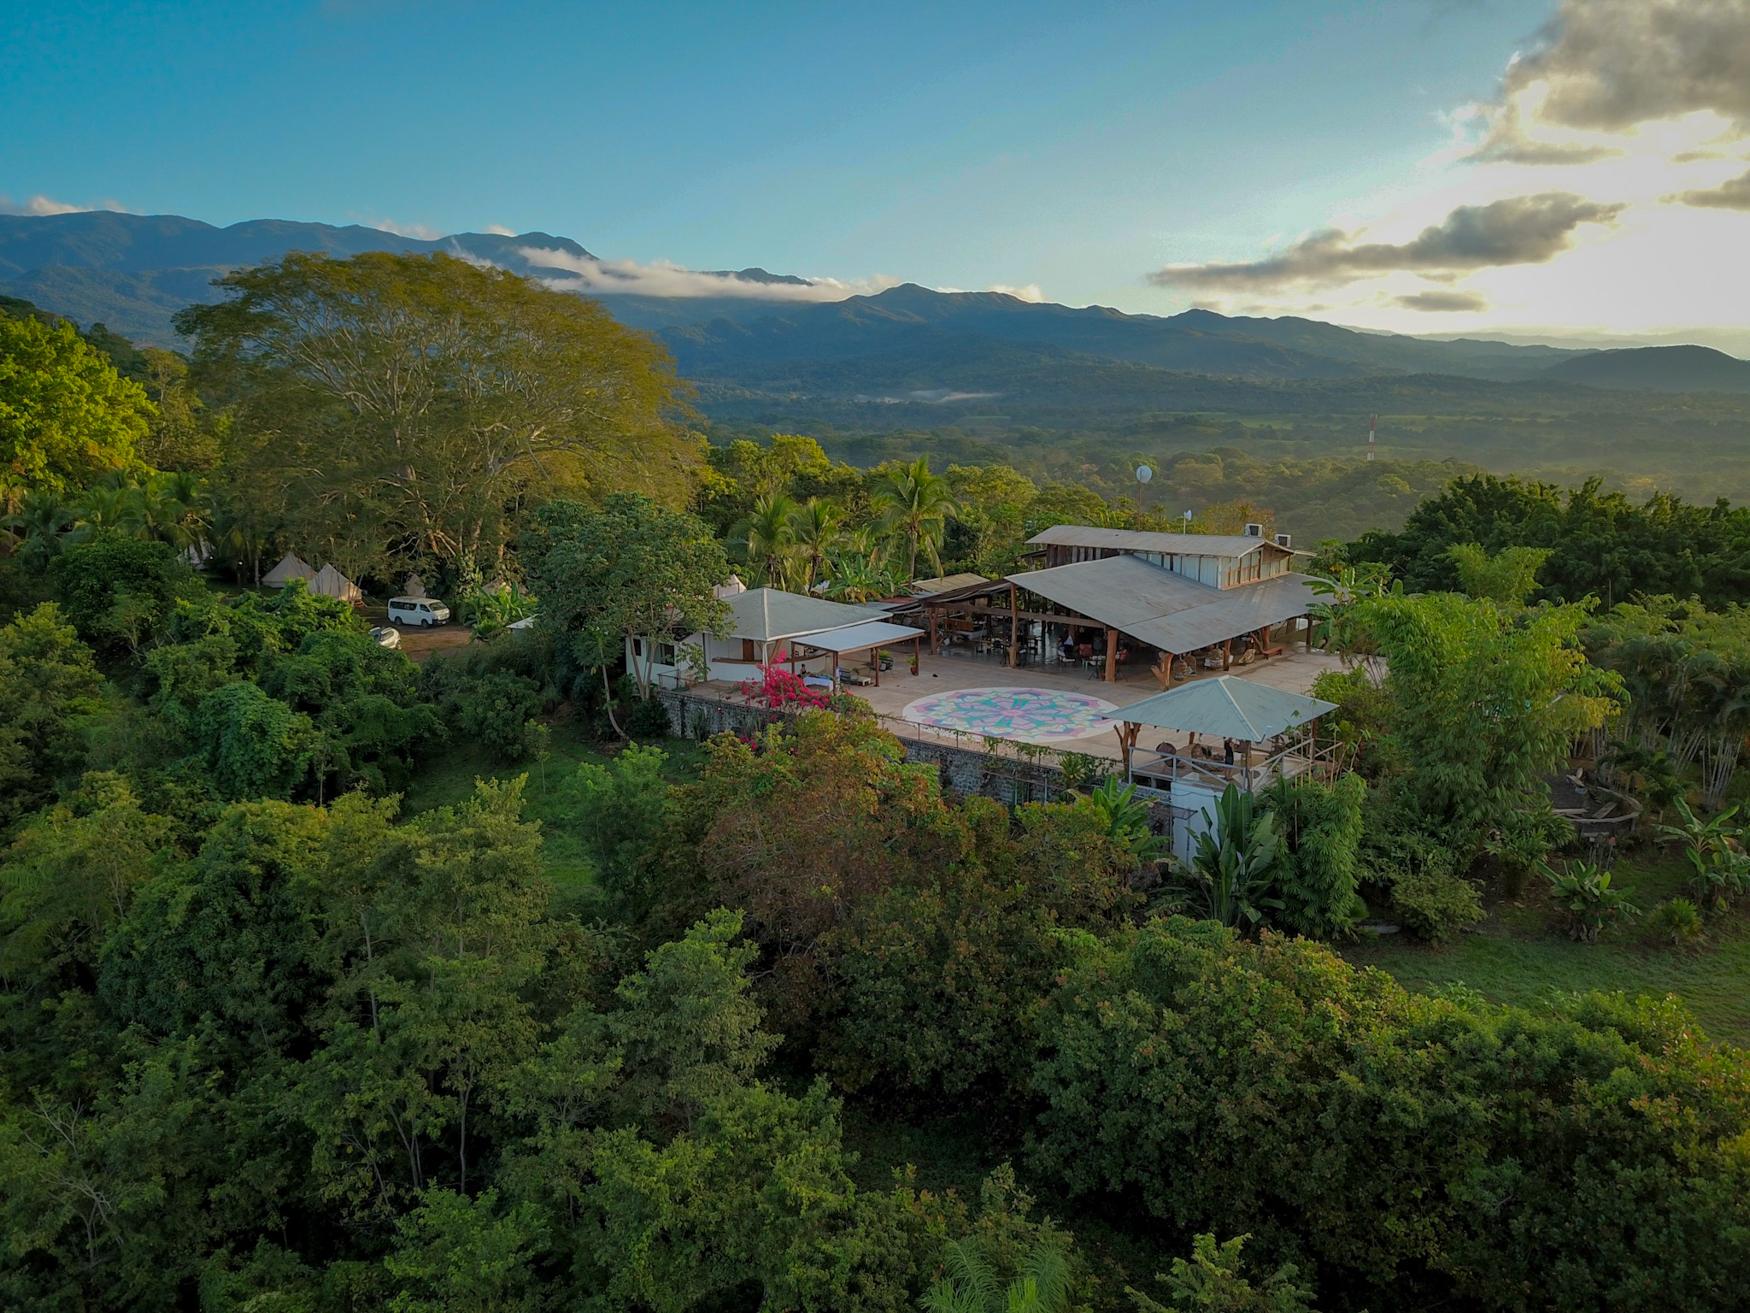 Yoga-Retreat-Drone-Photography-Costa-Rica-31.jpg